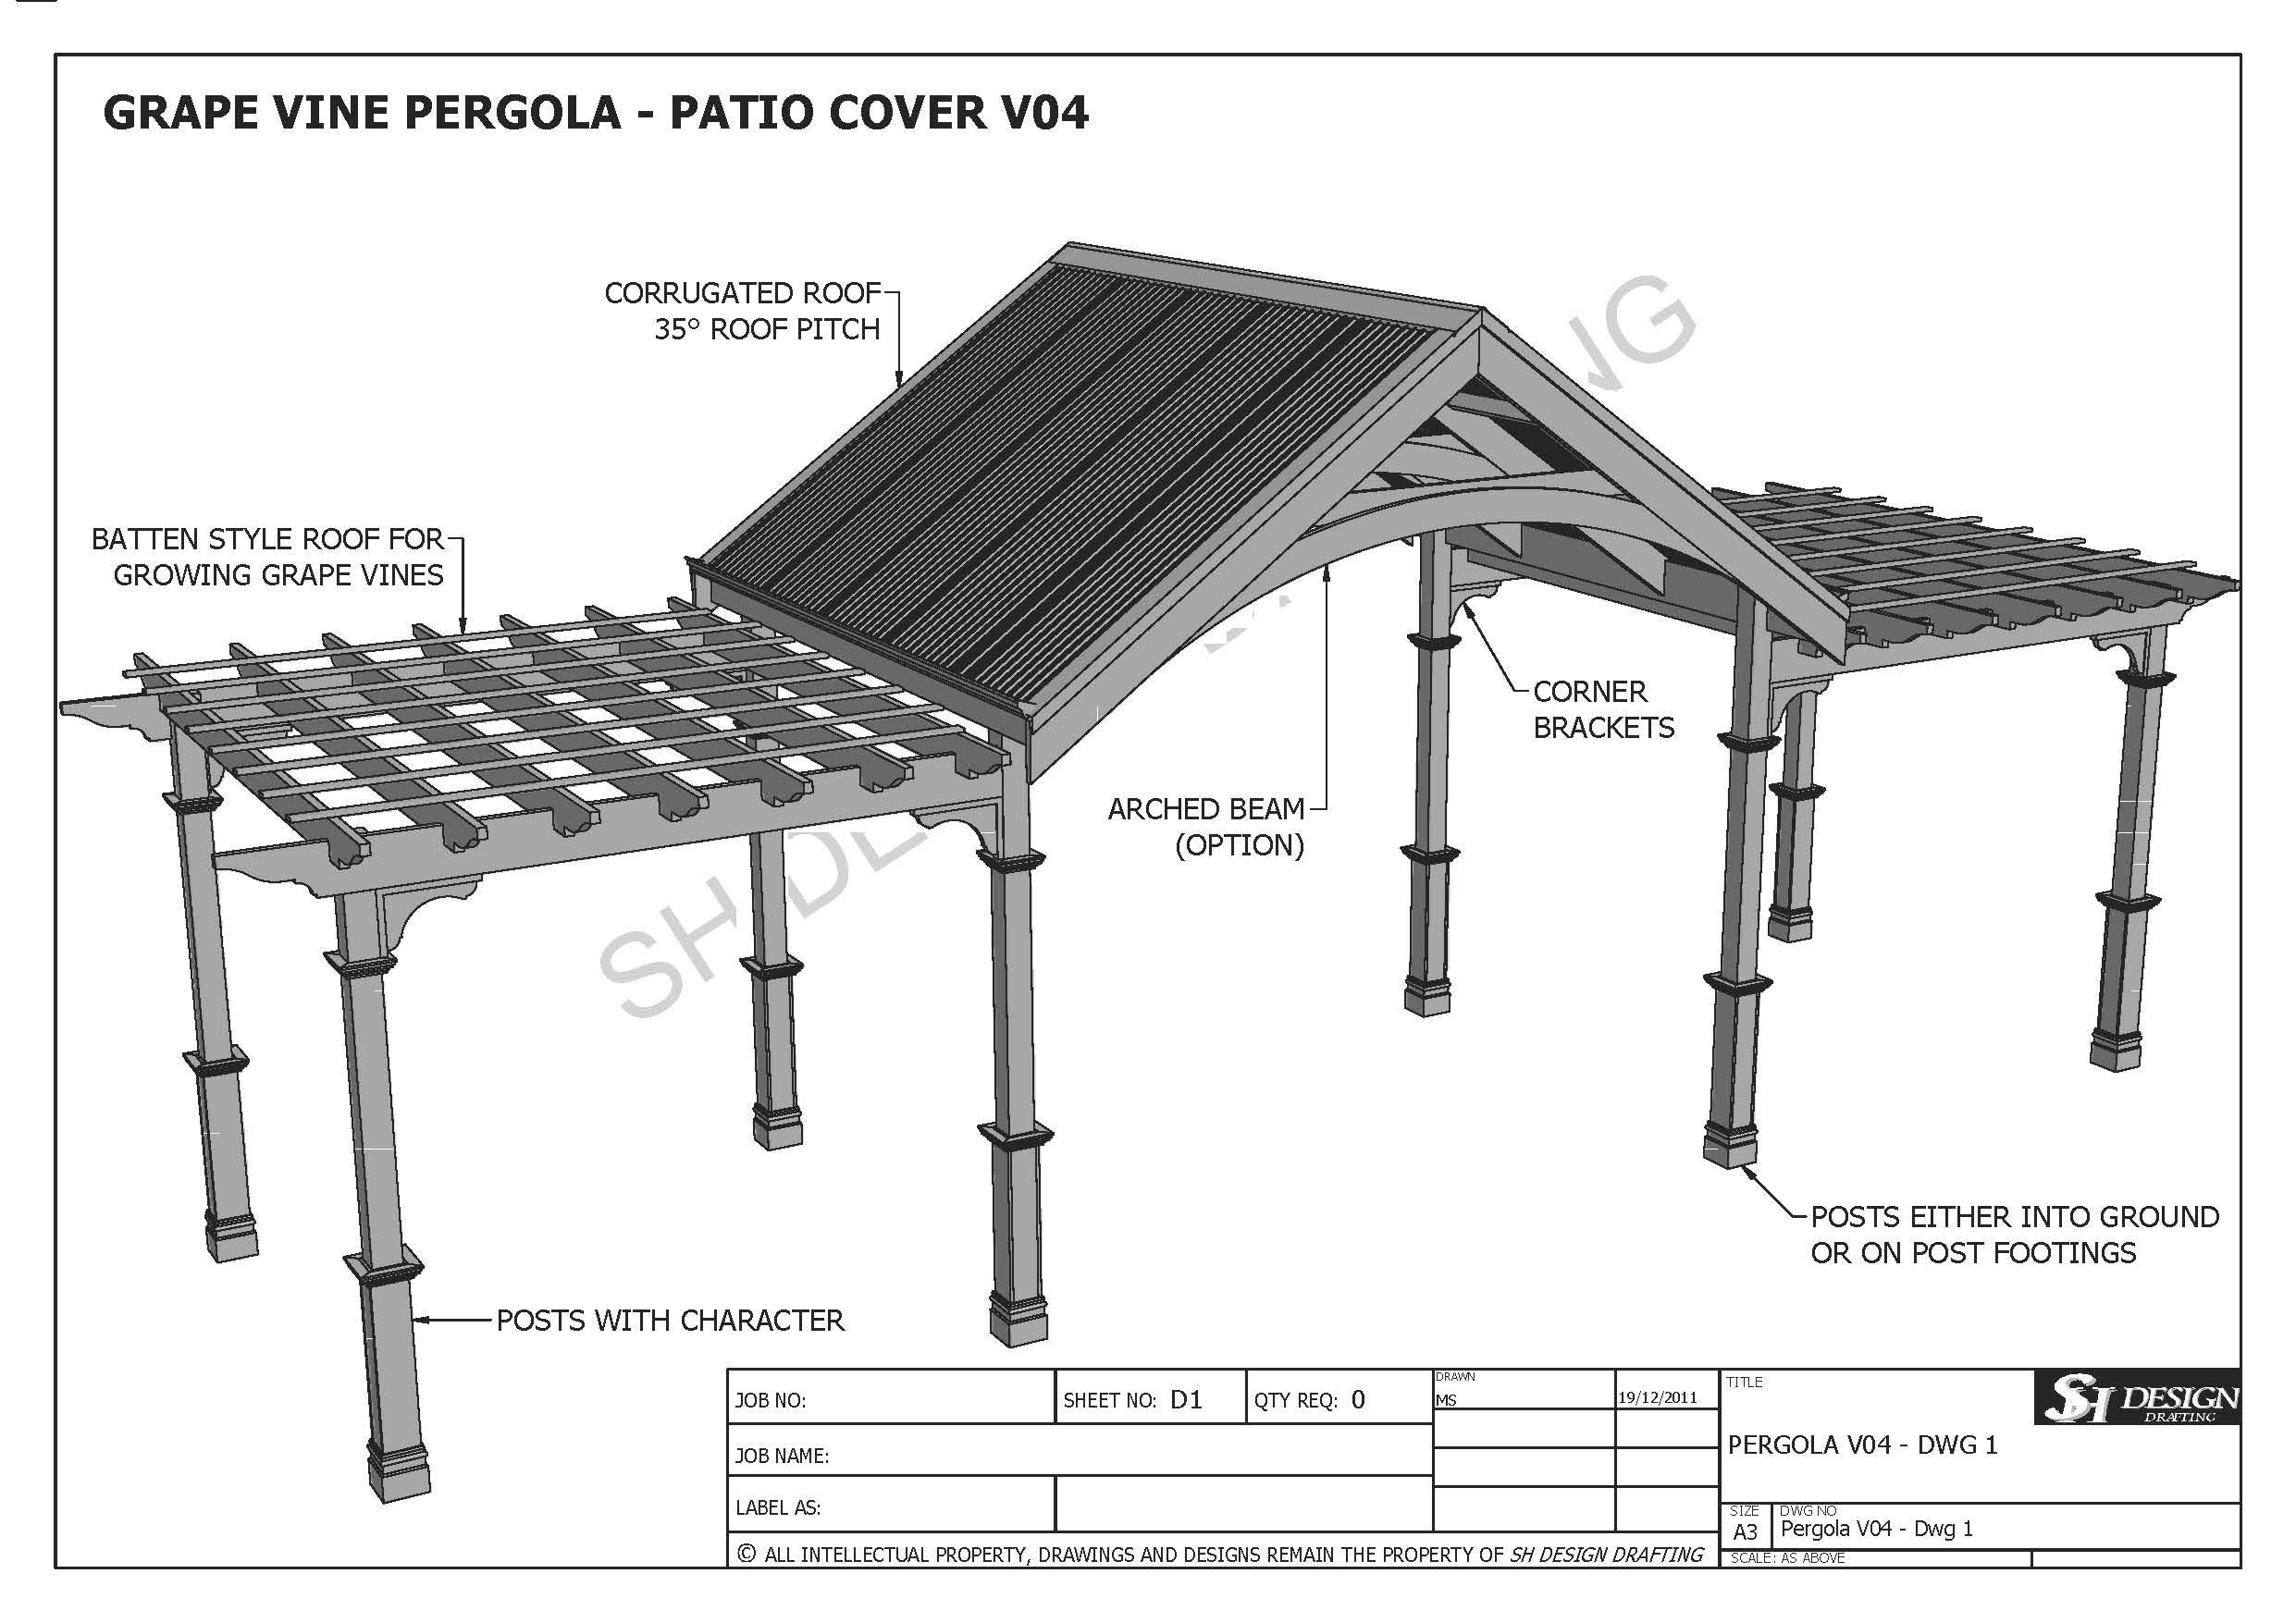 GRAPE VINE OUTDOOR PERGOLA - PATIO COVER VERANDA V4 - Full ...